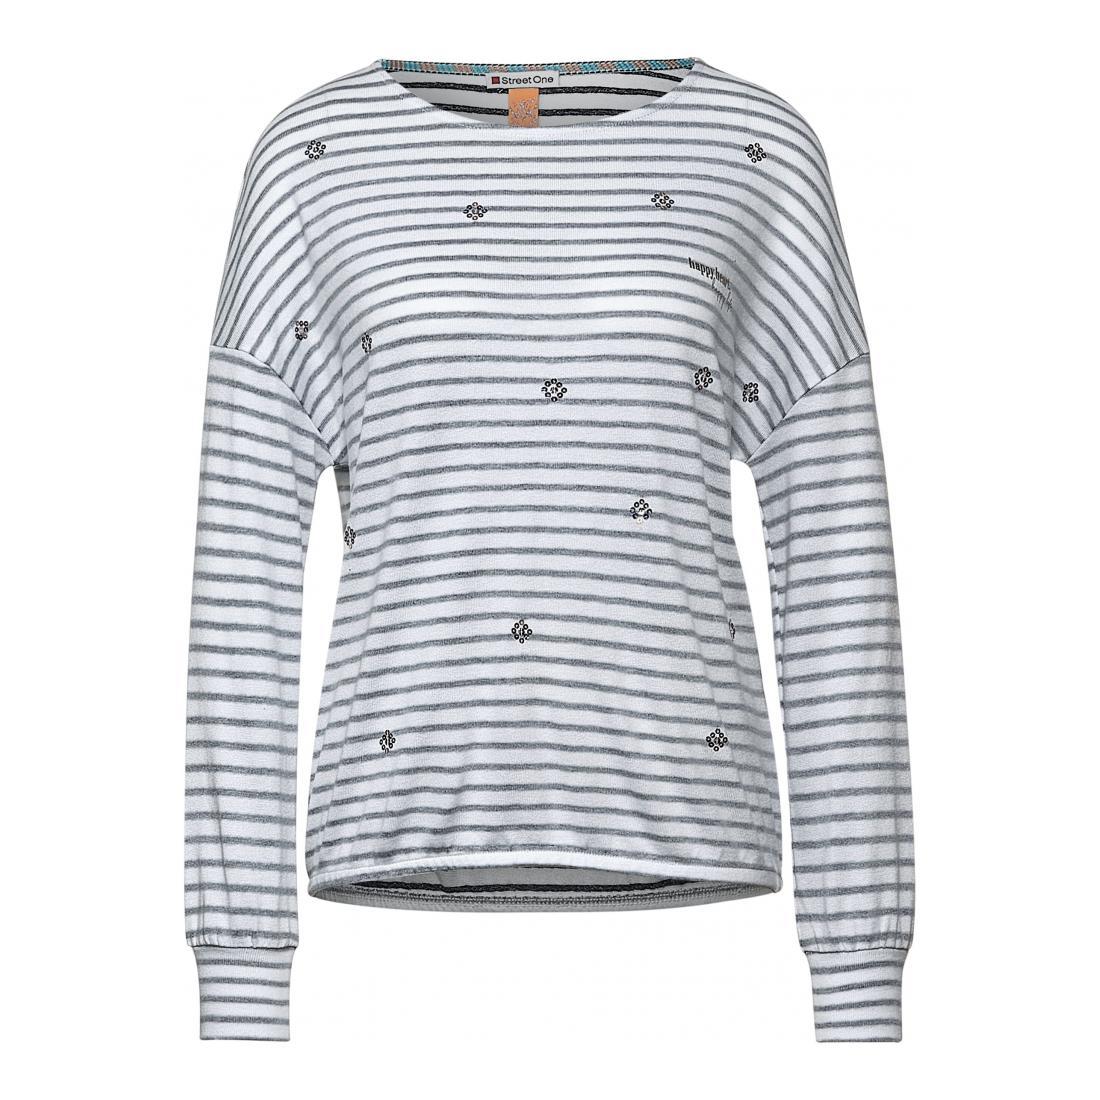 Street One Longsleeves Damen LTD QR stripe shirt w.seq